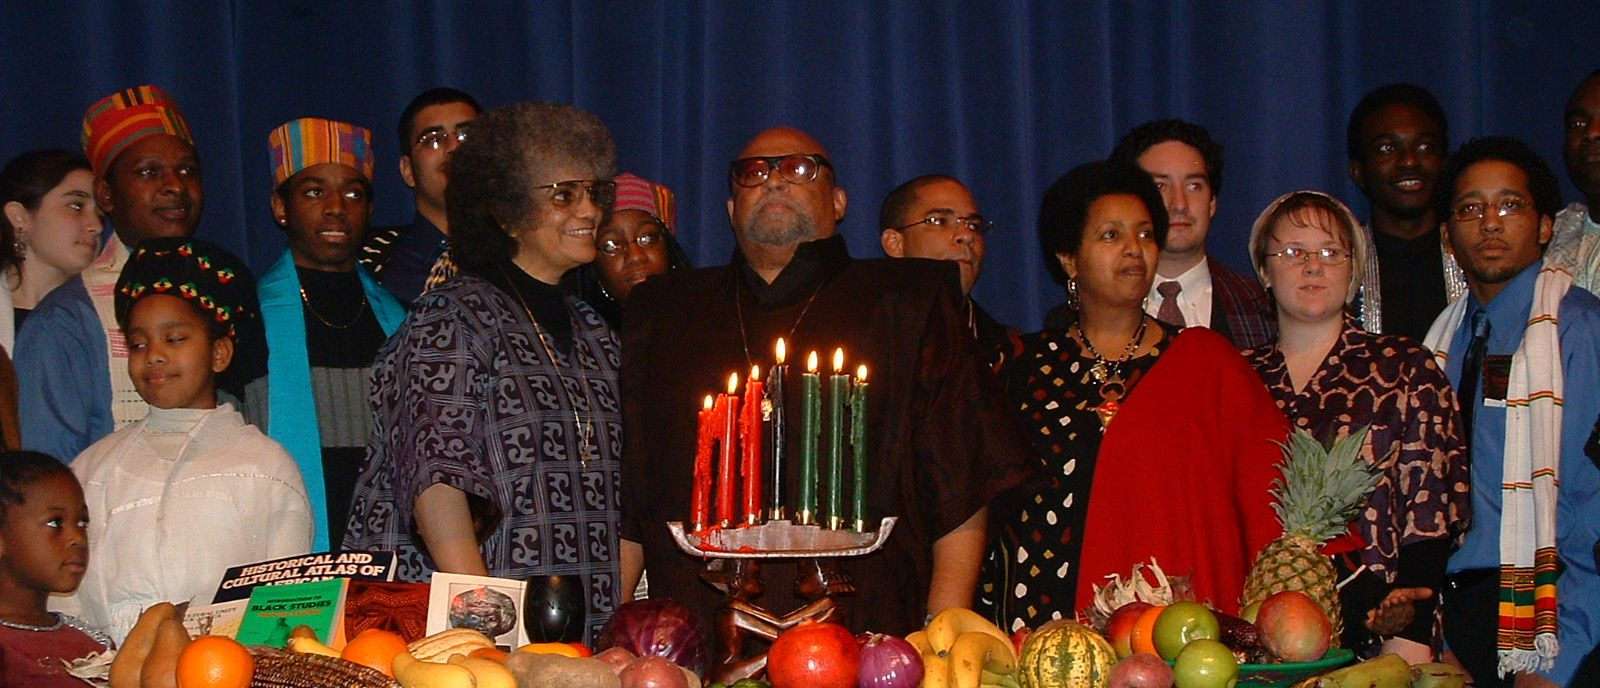 Maulana Karenga celebrating Kwanzaa